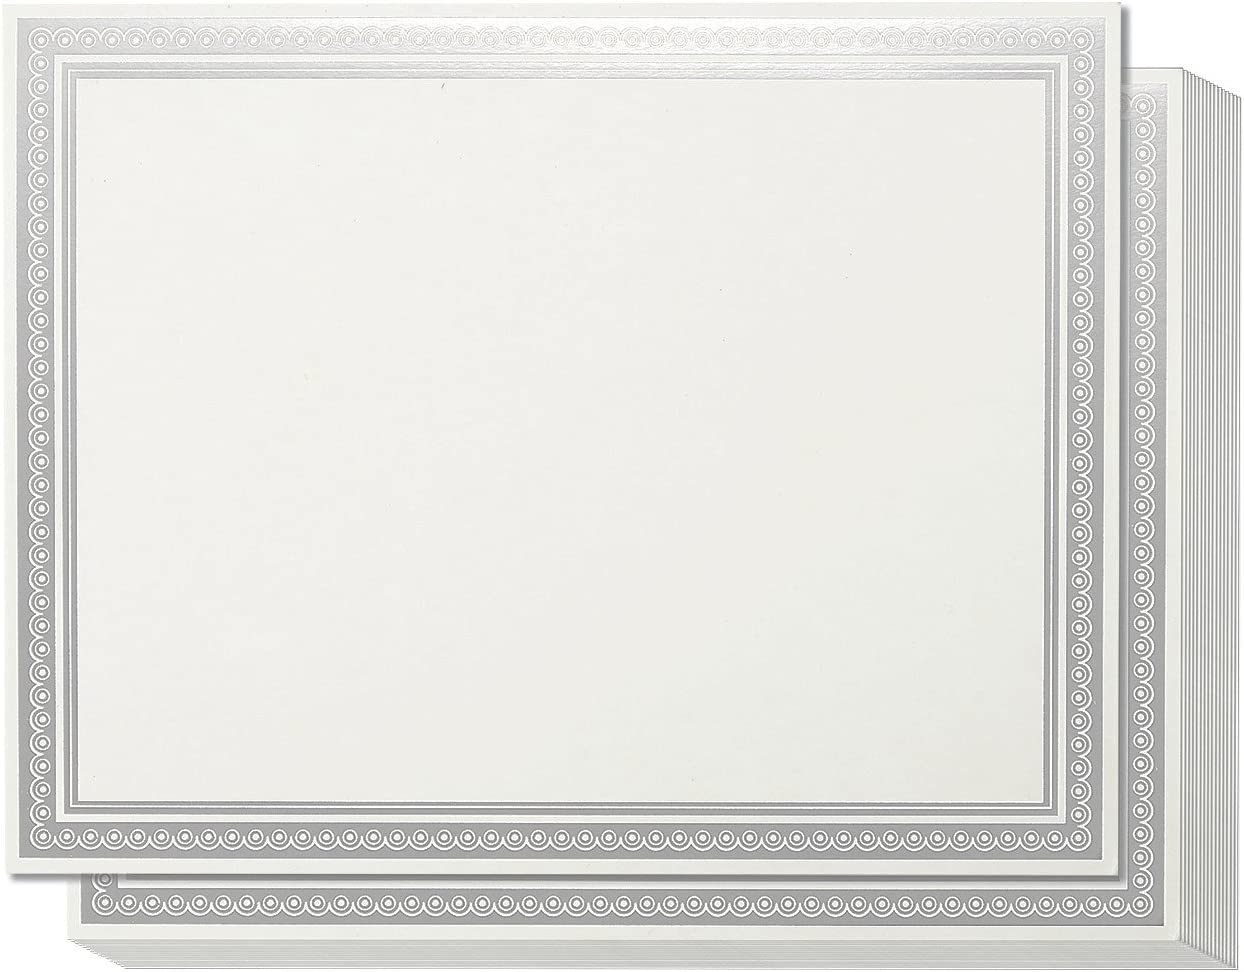 50 Pack Award Certificate Paper Silver Foil Border, Letter Size (Ivory, 8.5 x 11)